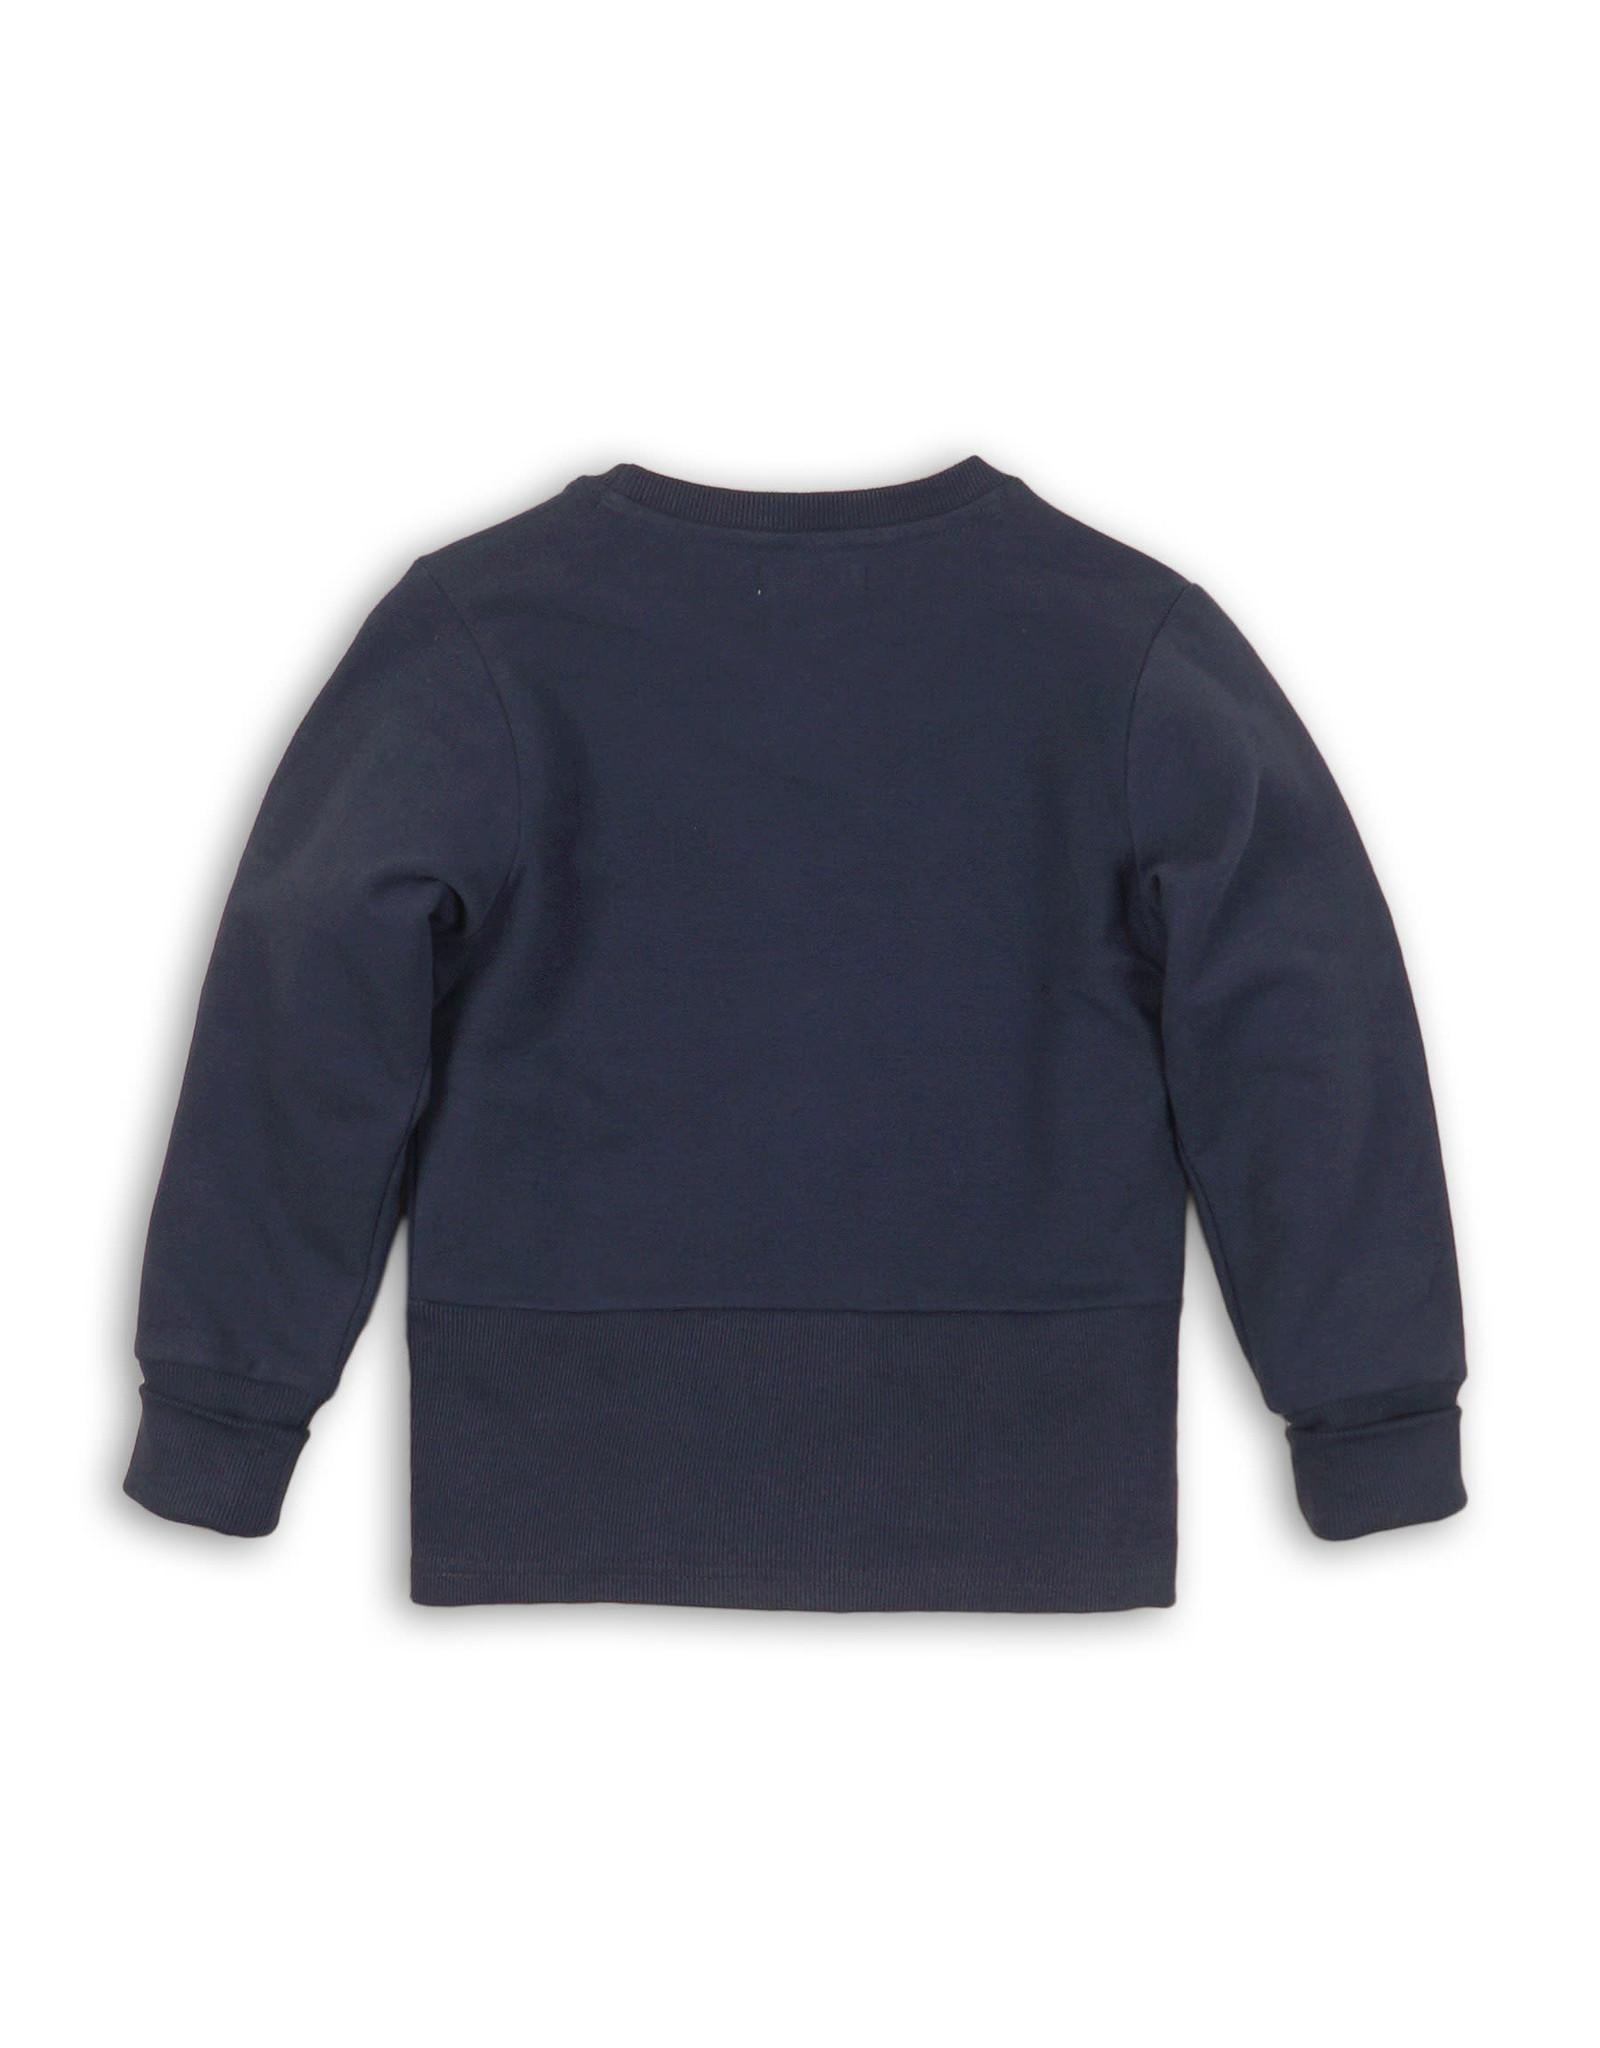 DJ Dutchjeans DJ Dutchjeans meiden sweater LOVE SPARKLE SHINE